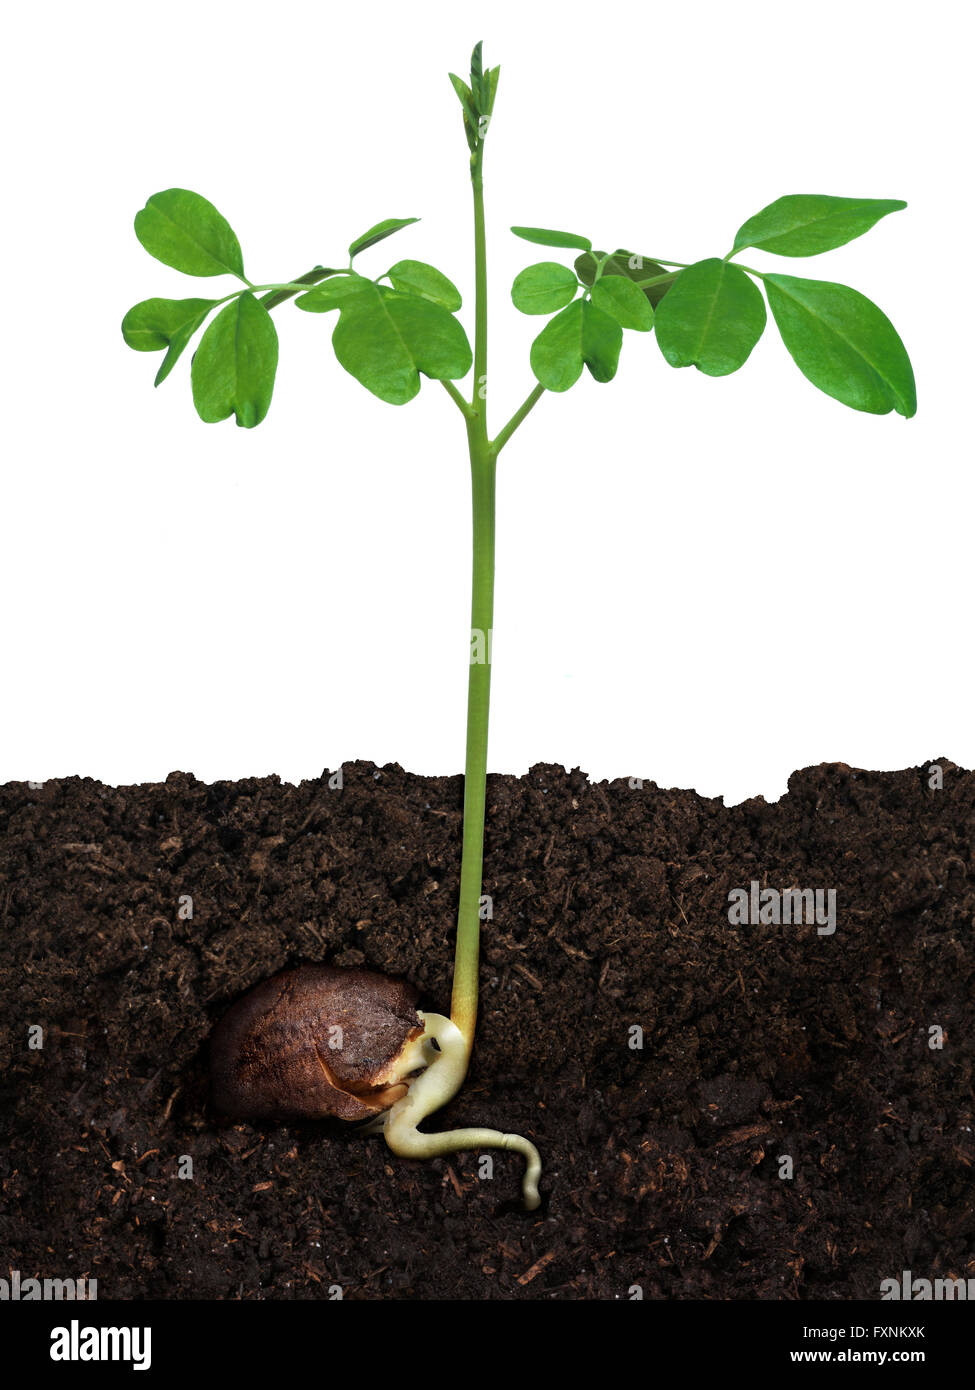 Moringa (Moringa oleifera) plant growing from a seed in soil - Stock Image